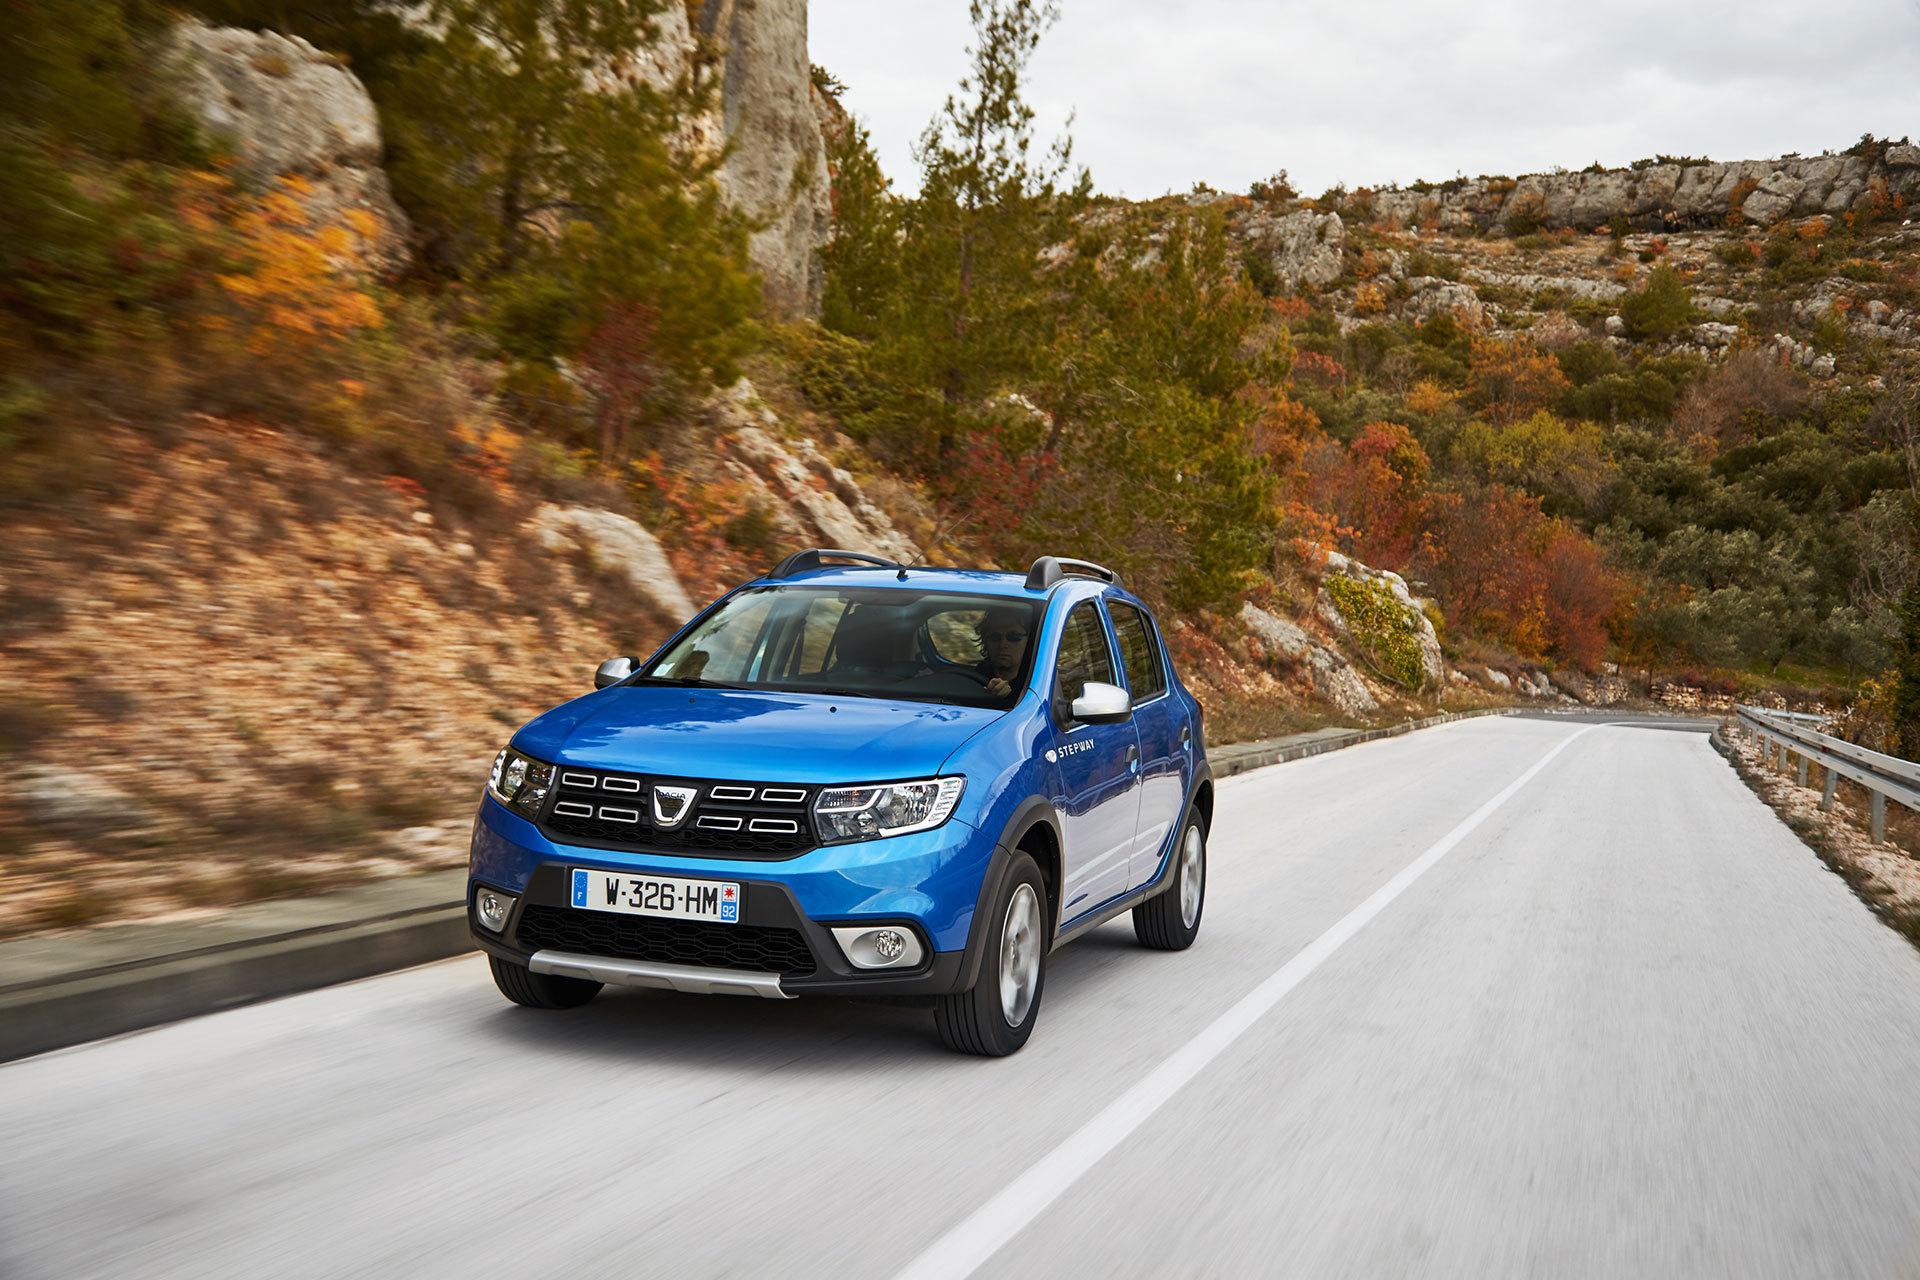 Dacia Sandero Stepway 2019 Azul 04